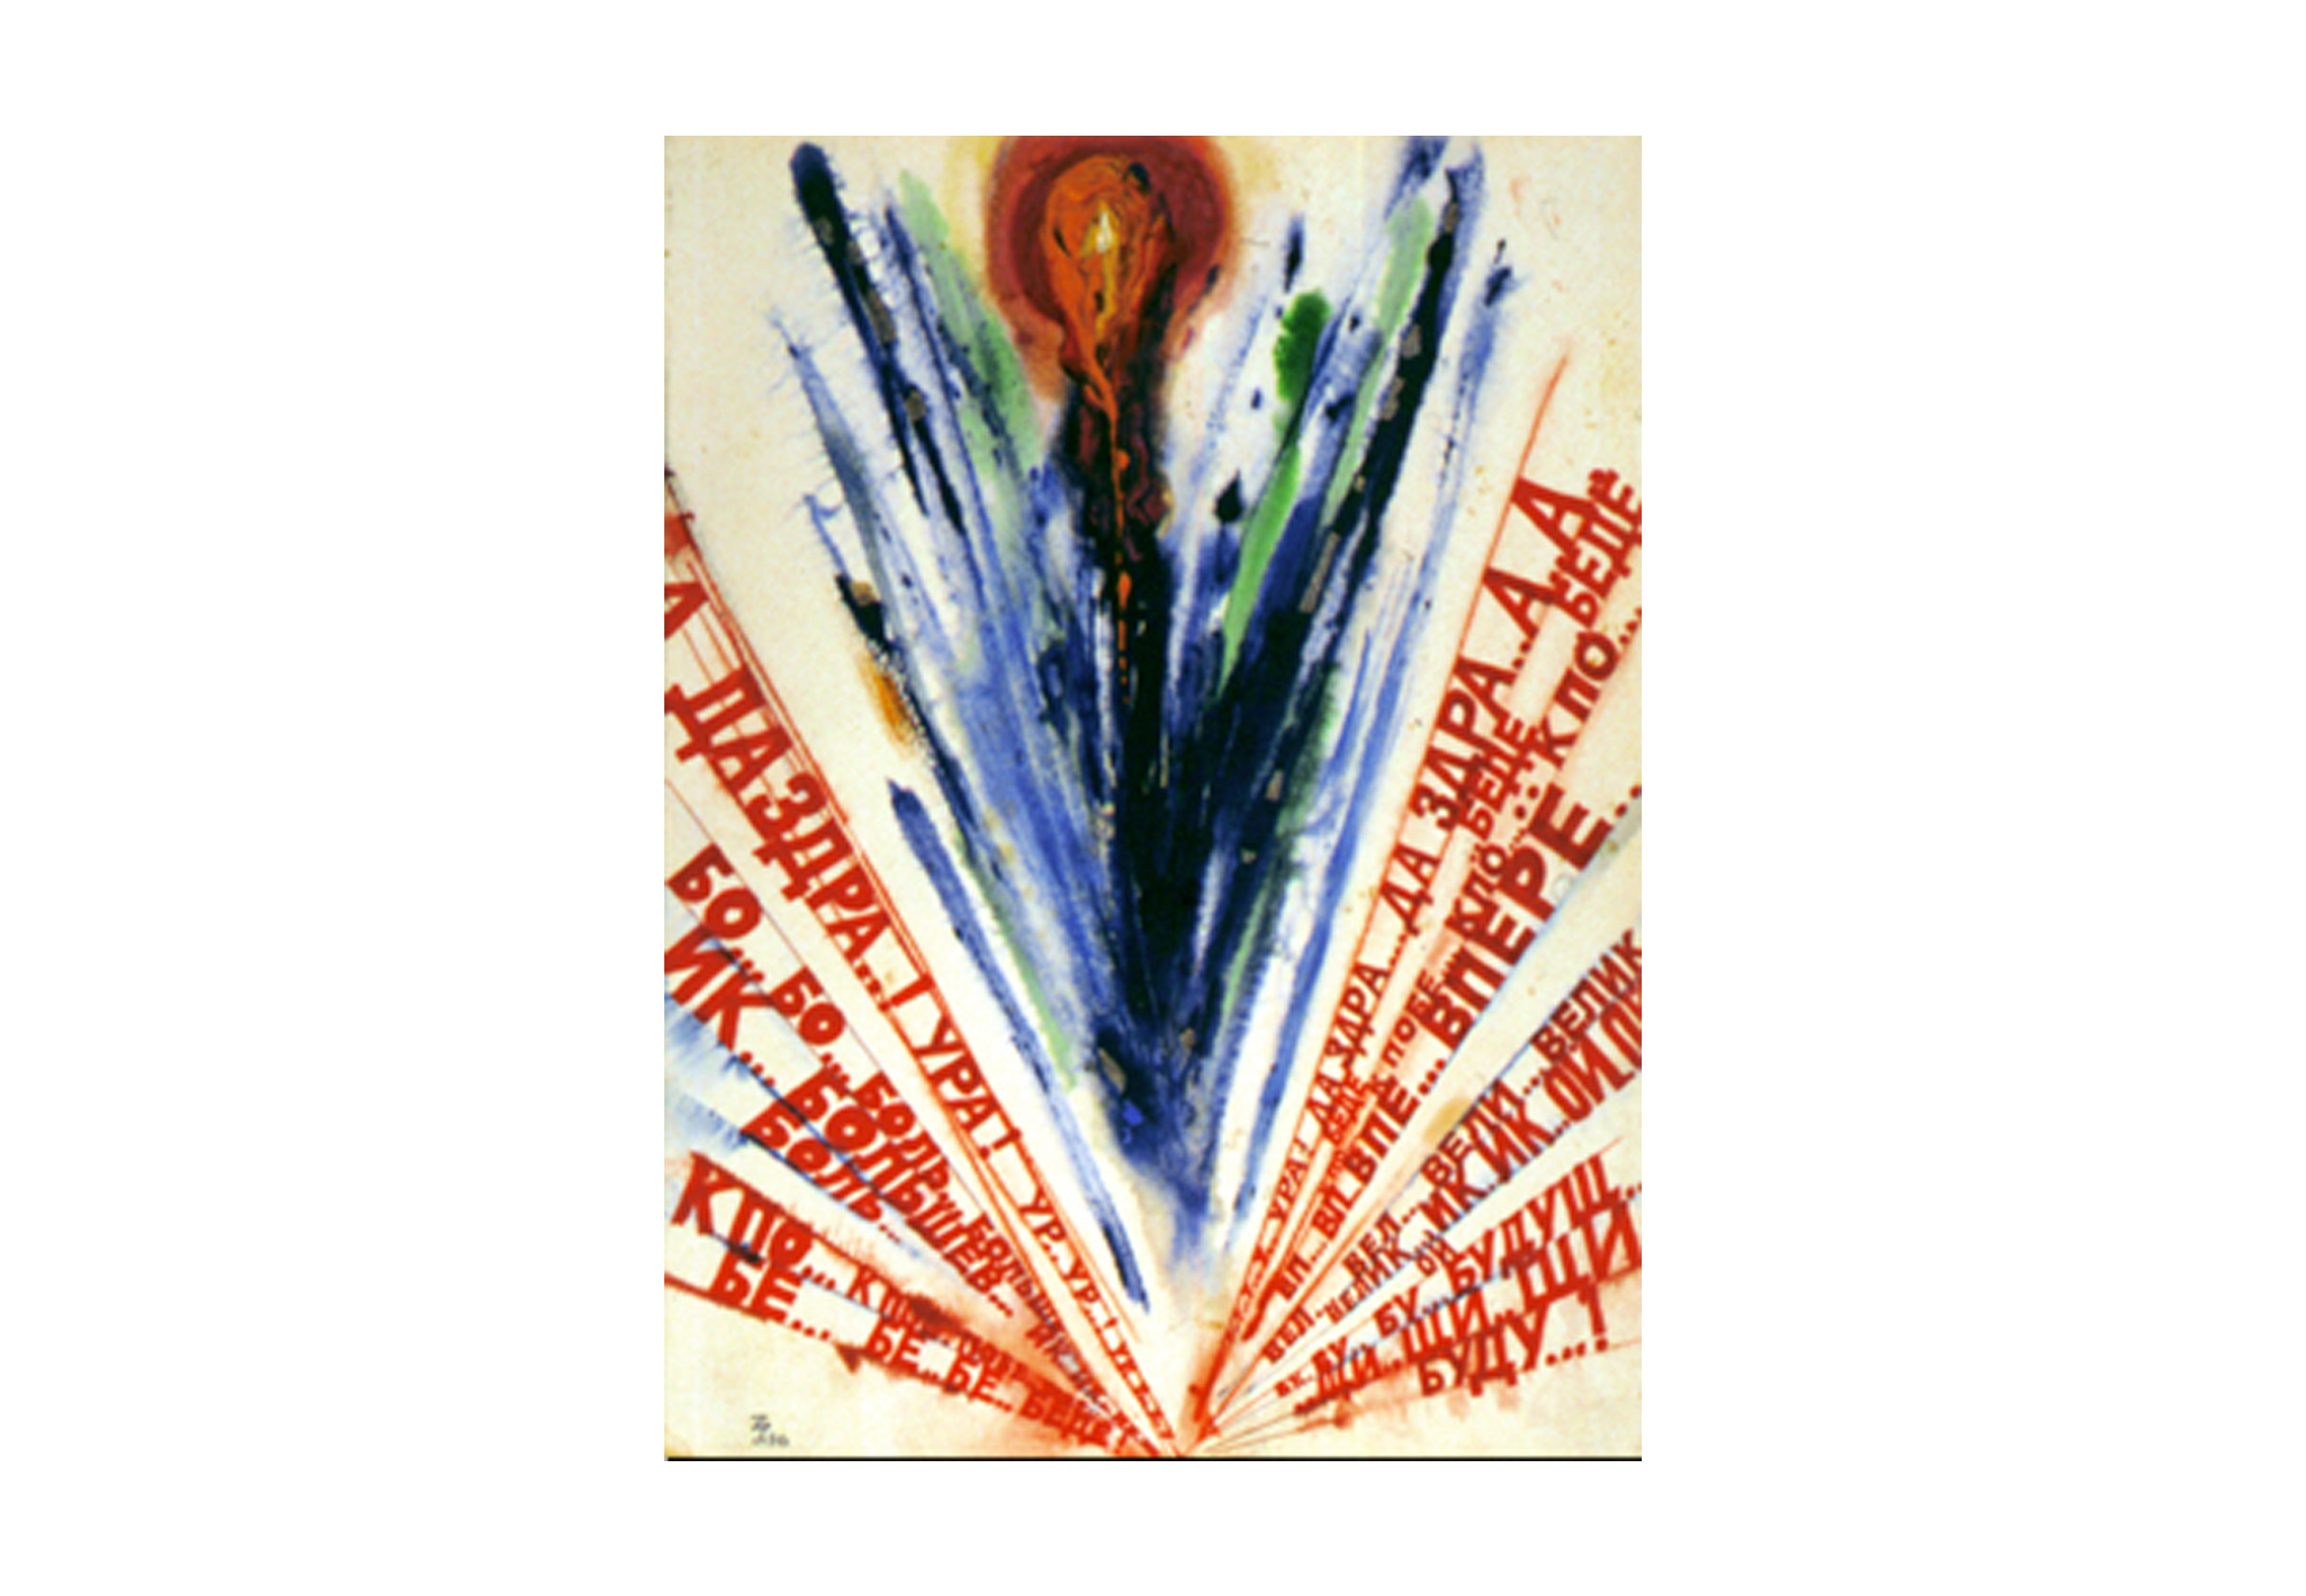 Lamm-Portfolio-1976-1980-2.jpg